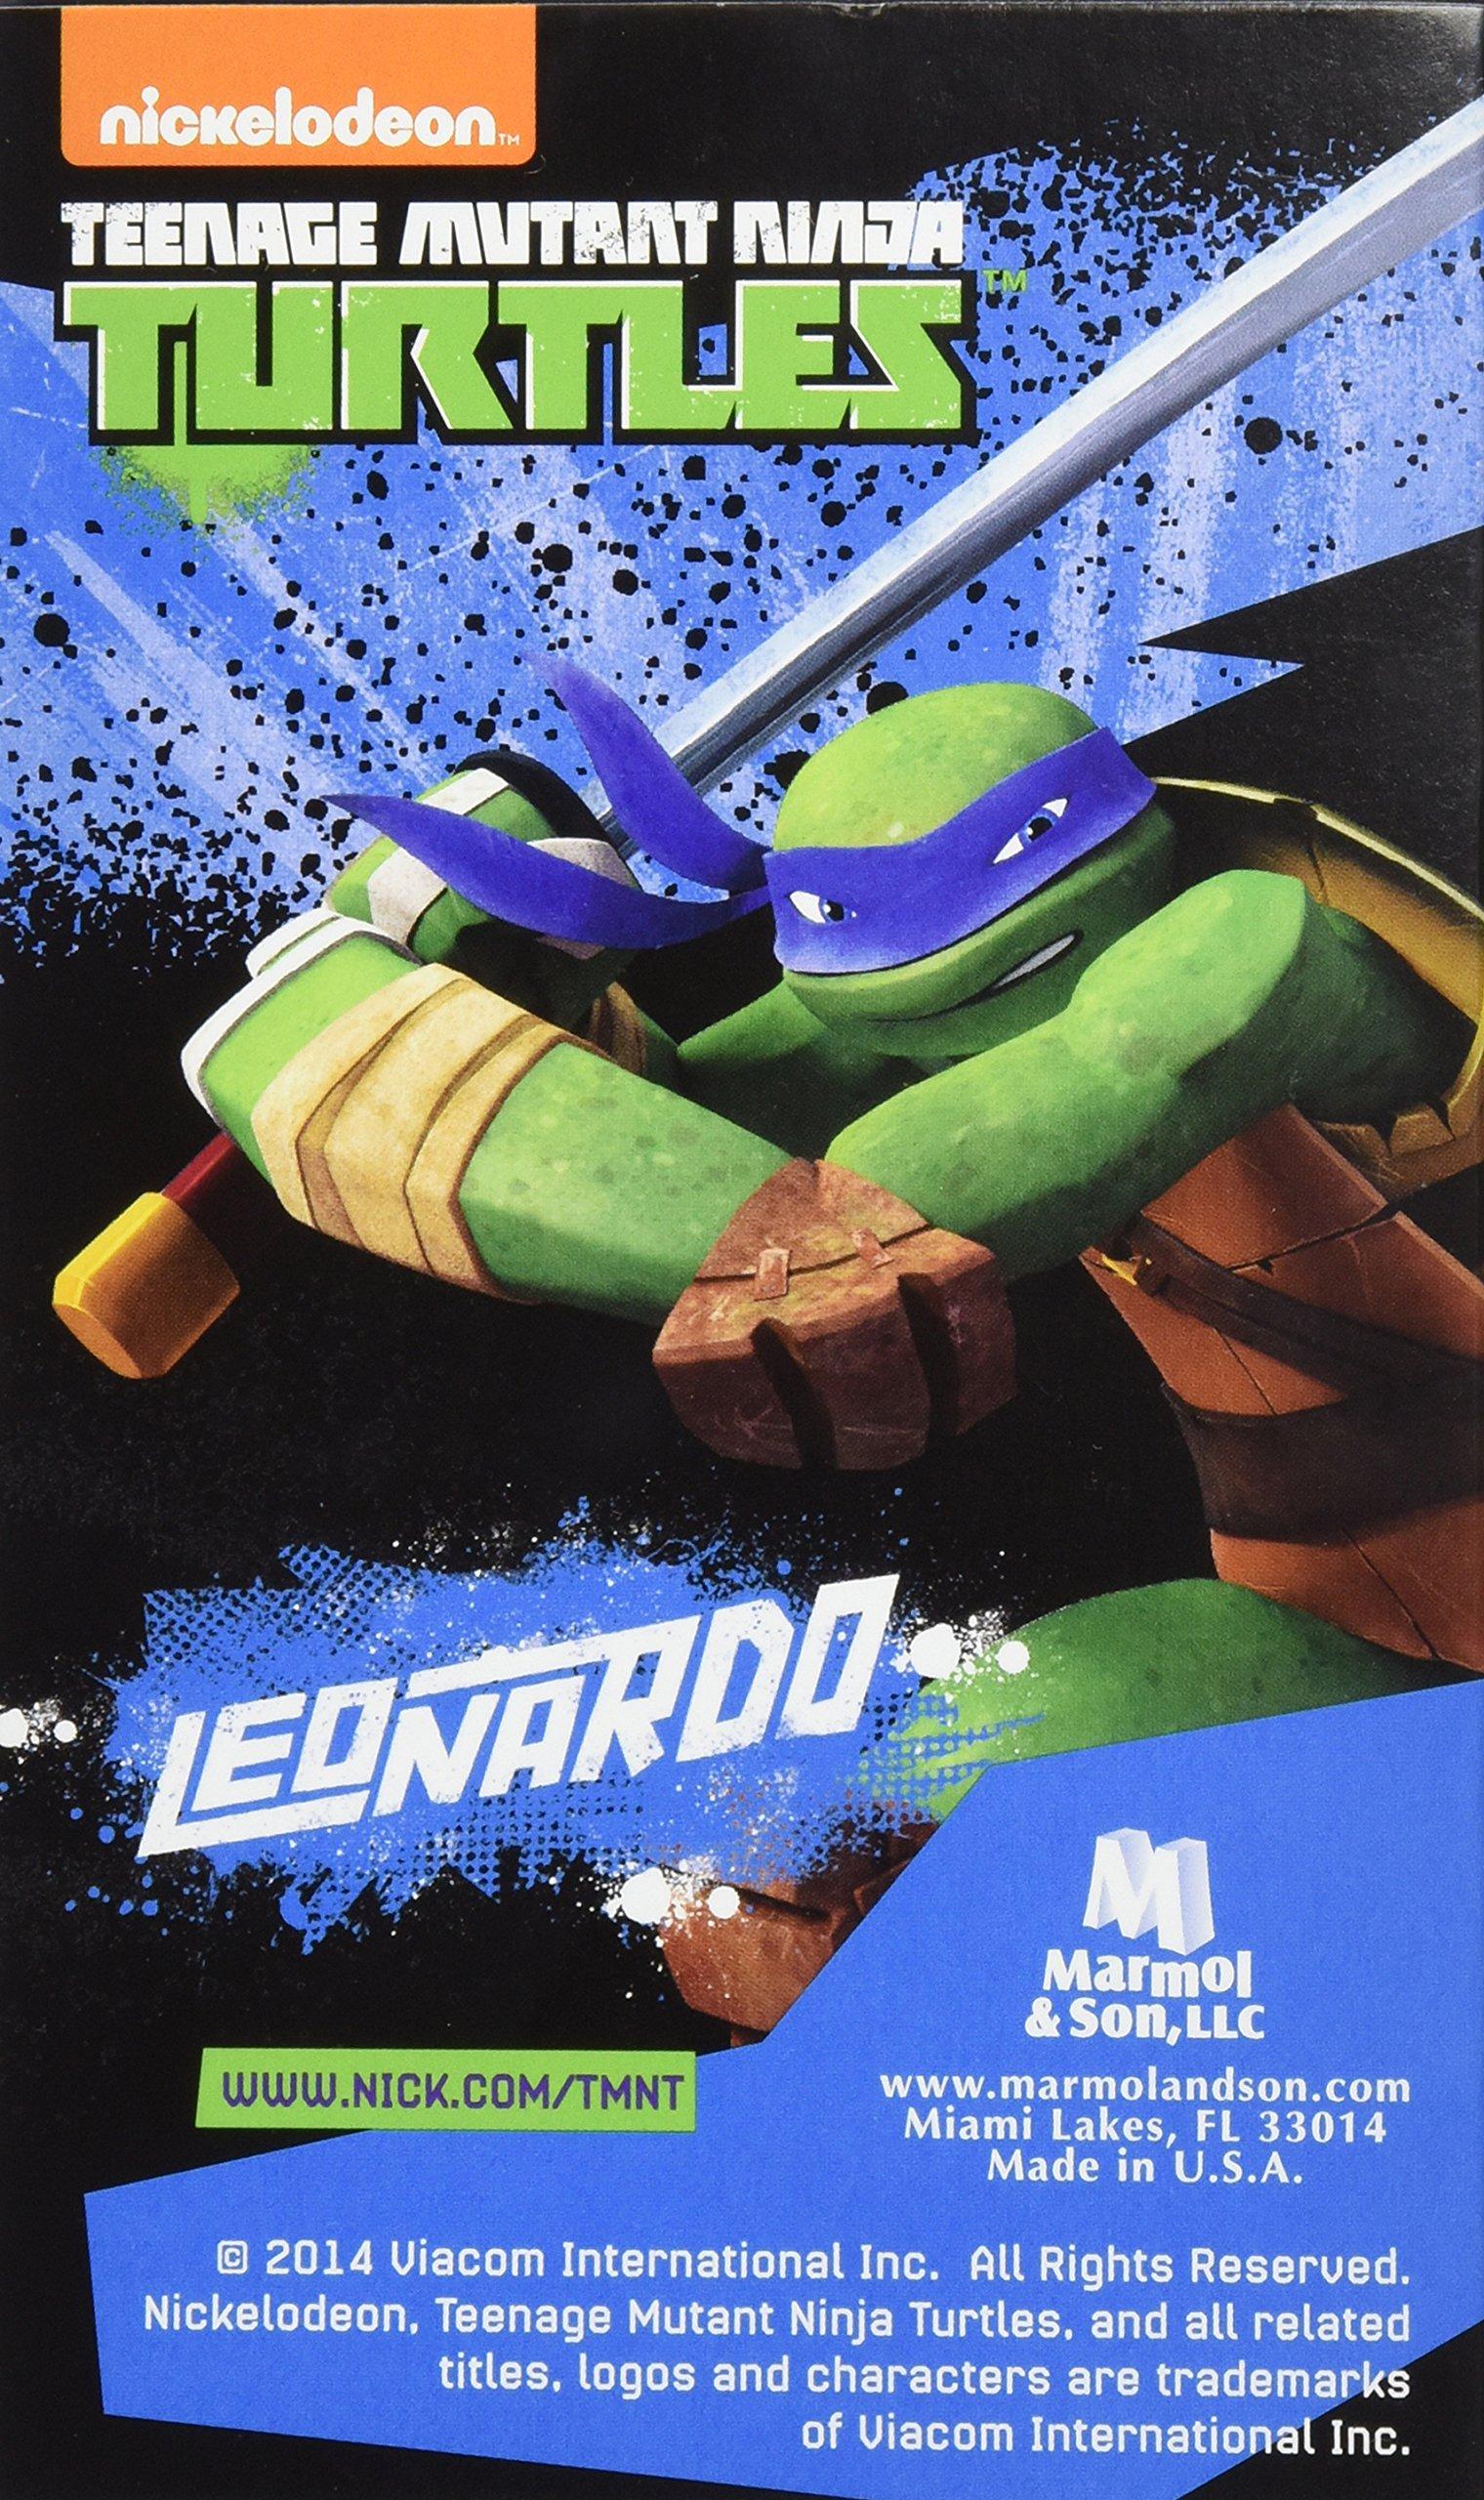 Teenage Mutant Ninja Turtles Leonardo by Nickelodeon for Kids - 3.4 oz EDT Spray by Marmol & Son (Image #2)